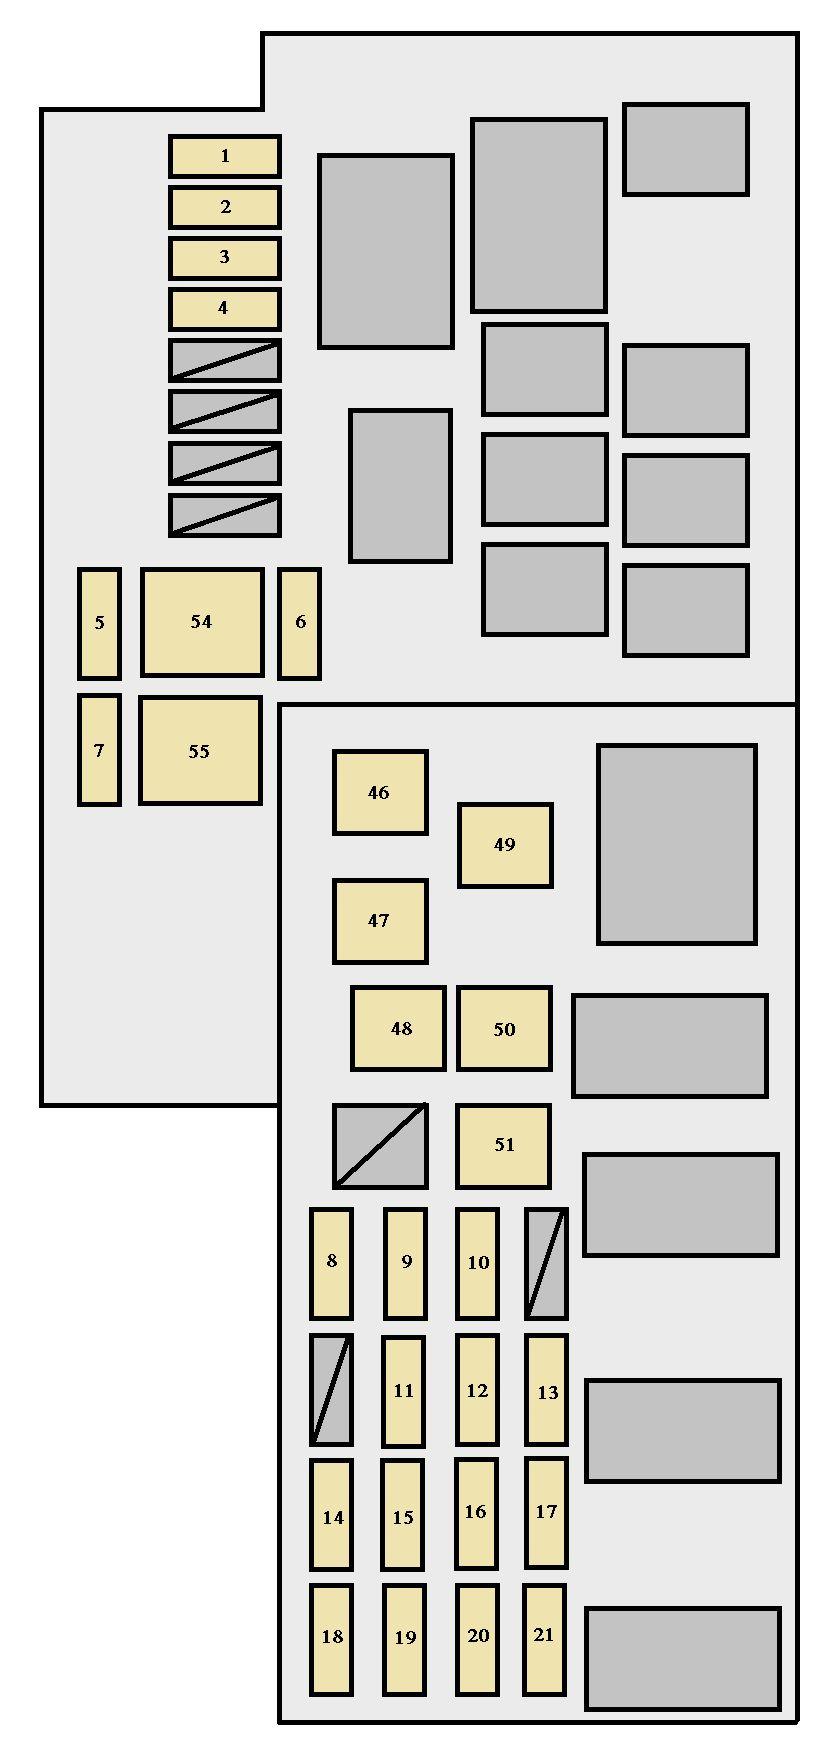 [DIAGRAM_38IU]  BL_2900] Toyota Solara Fuse Box Diagram Schematic Wiring | 2002 Toyota Solara Fuse Box |  | Diog Ginou Pelap Elec Mohammedshrine Librar Wiring 101